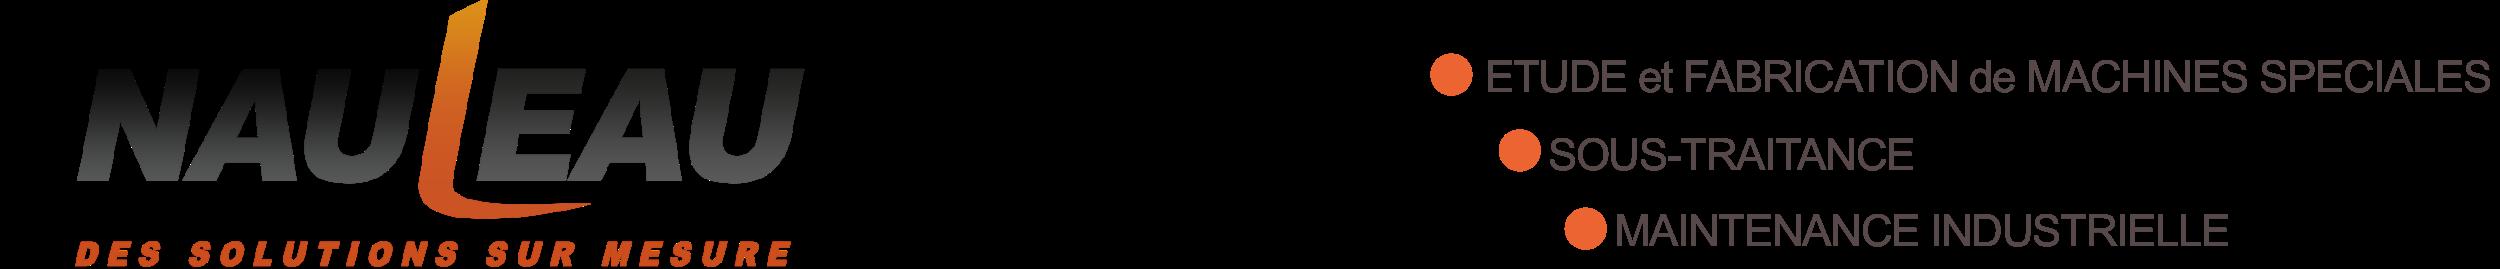 Nauleau